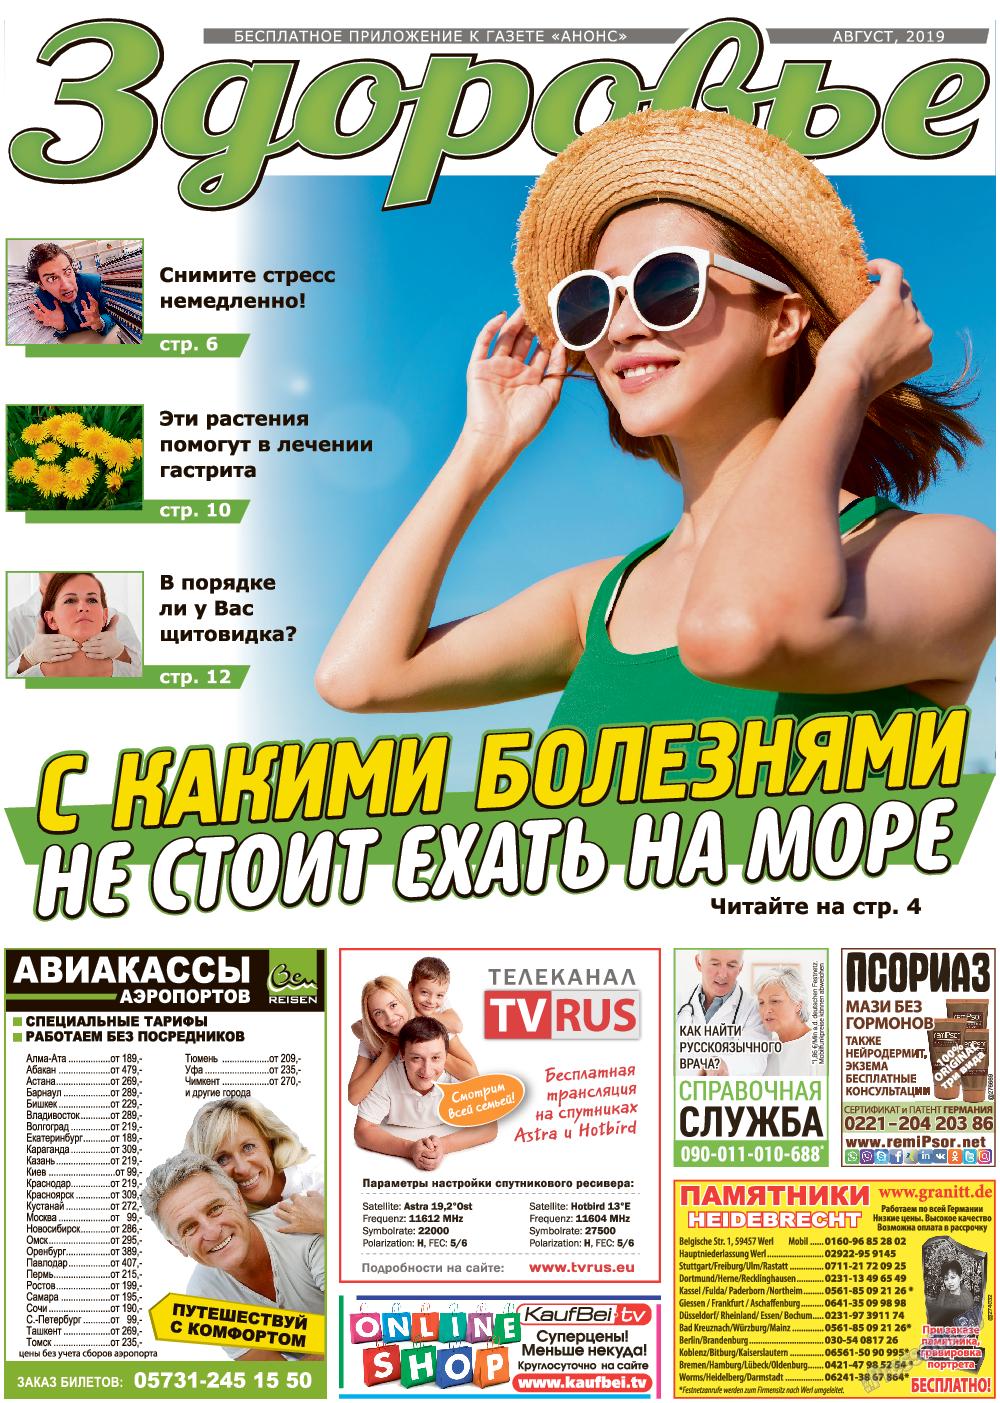 Здоровье (газета). 2019 год, номер 8, стр. 1